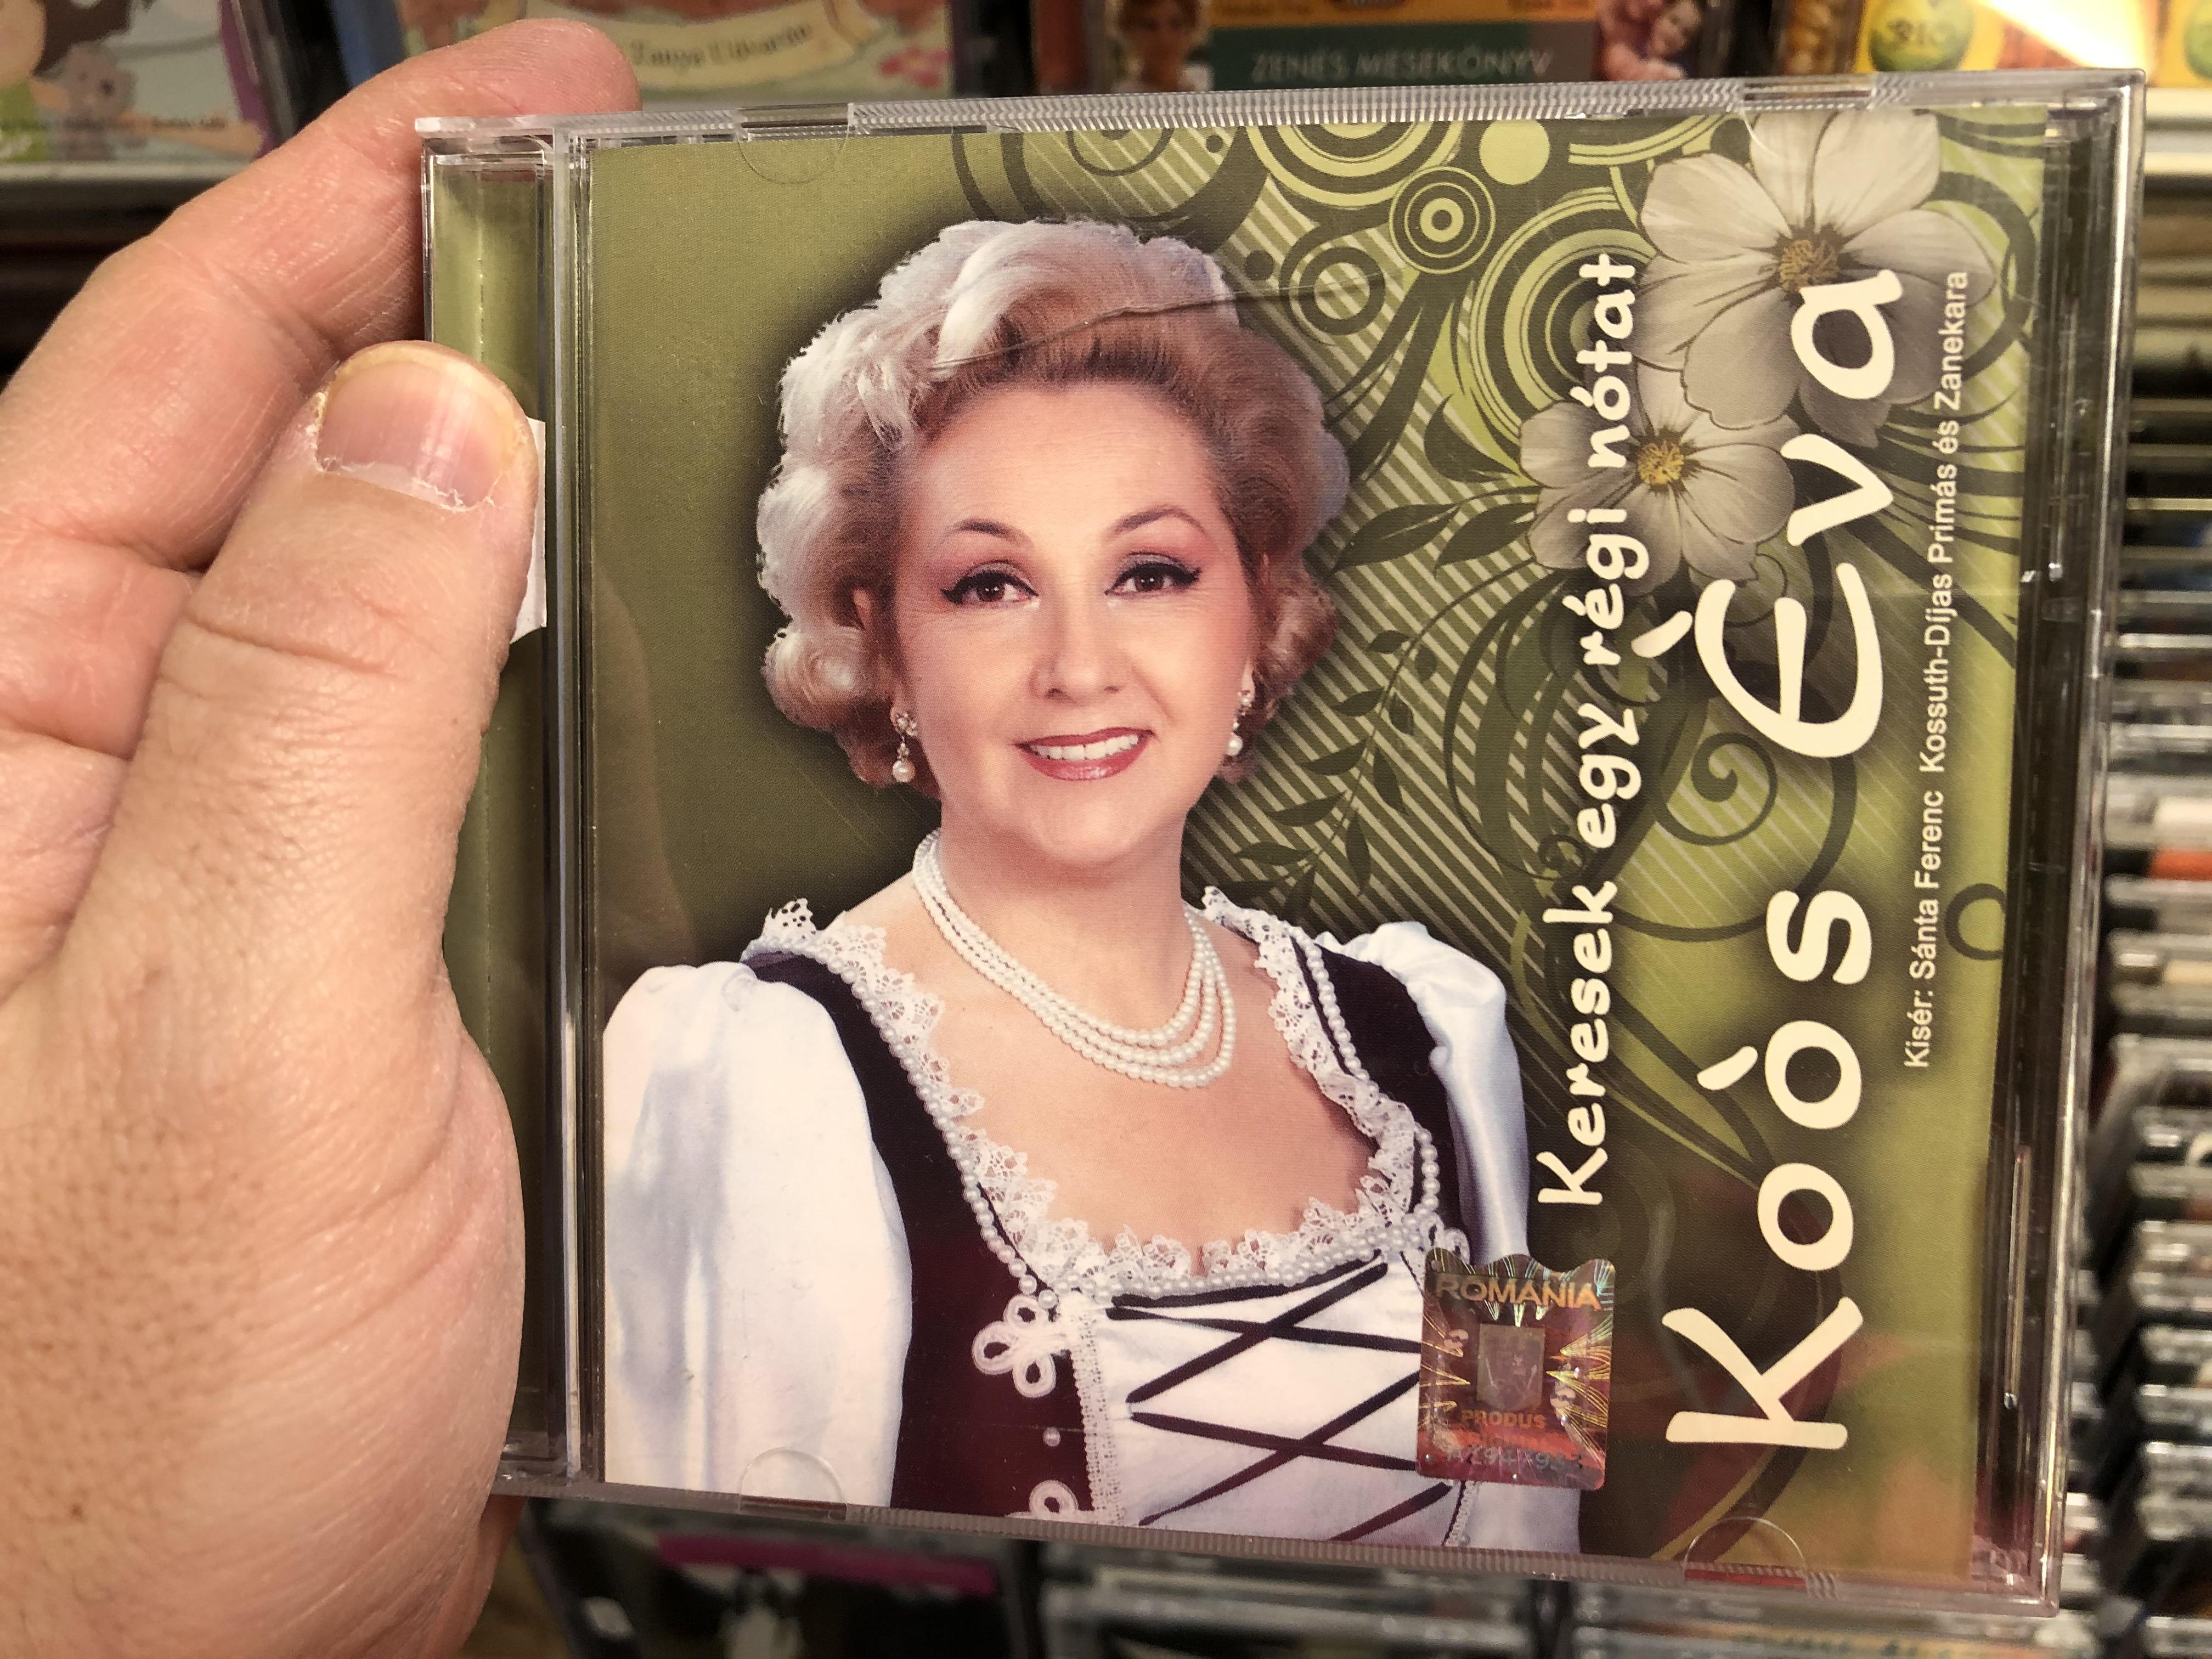 keresek-egy-r-gi-notat-ko-s-va-kiser-santa-ferenc-libris-audio-cd-2009-lb-121-1-.jpg